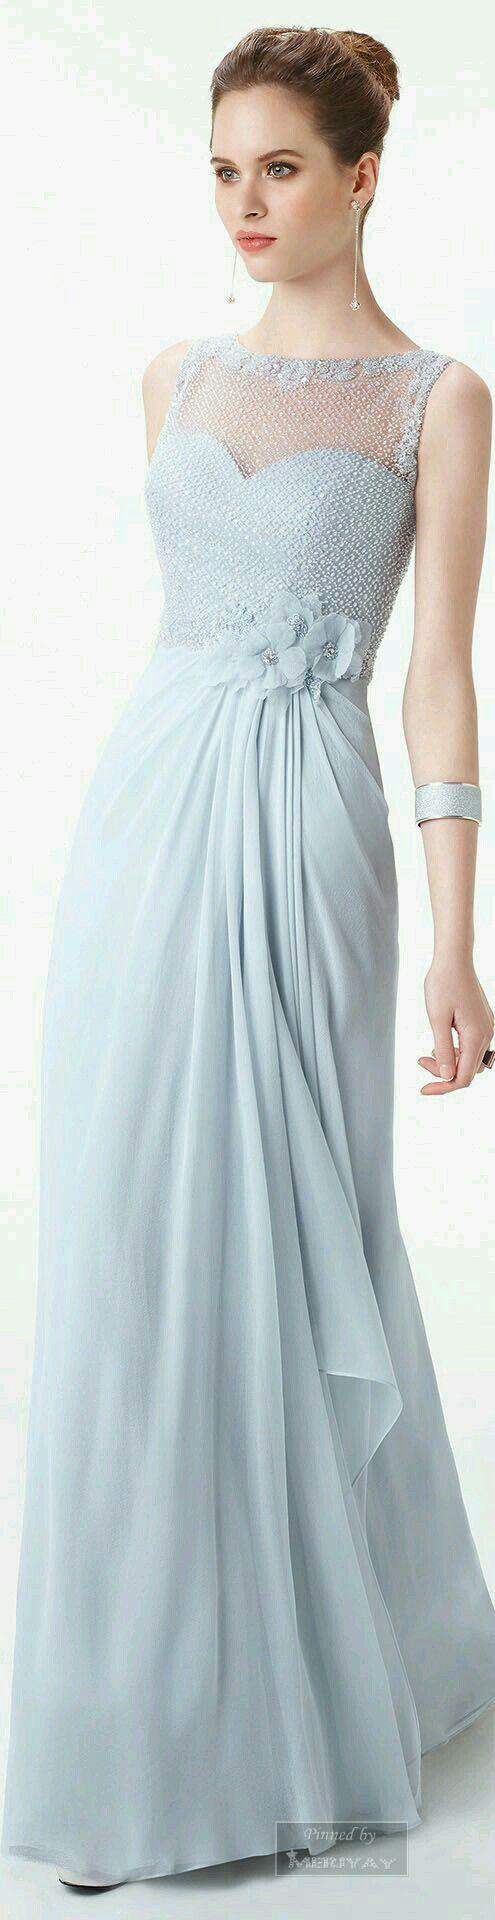 92 best Brokat Style images on Pinterest   Evening gowns, Lace ...